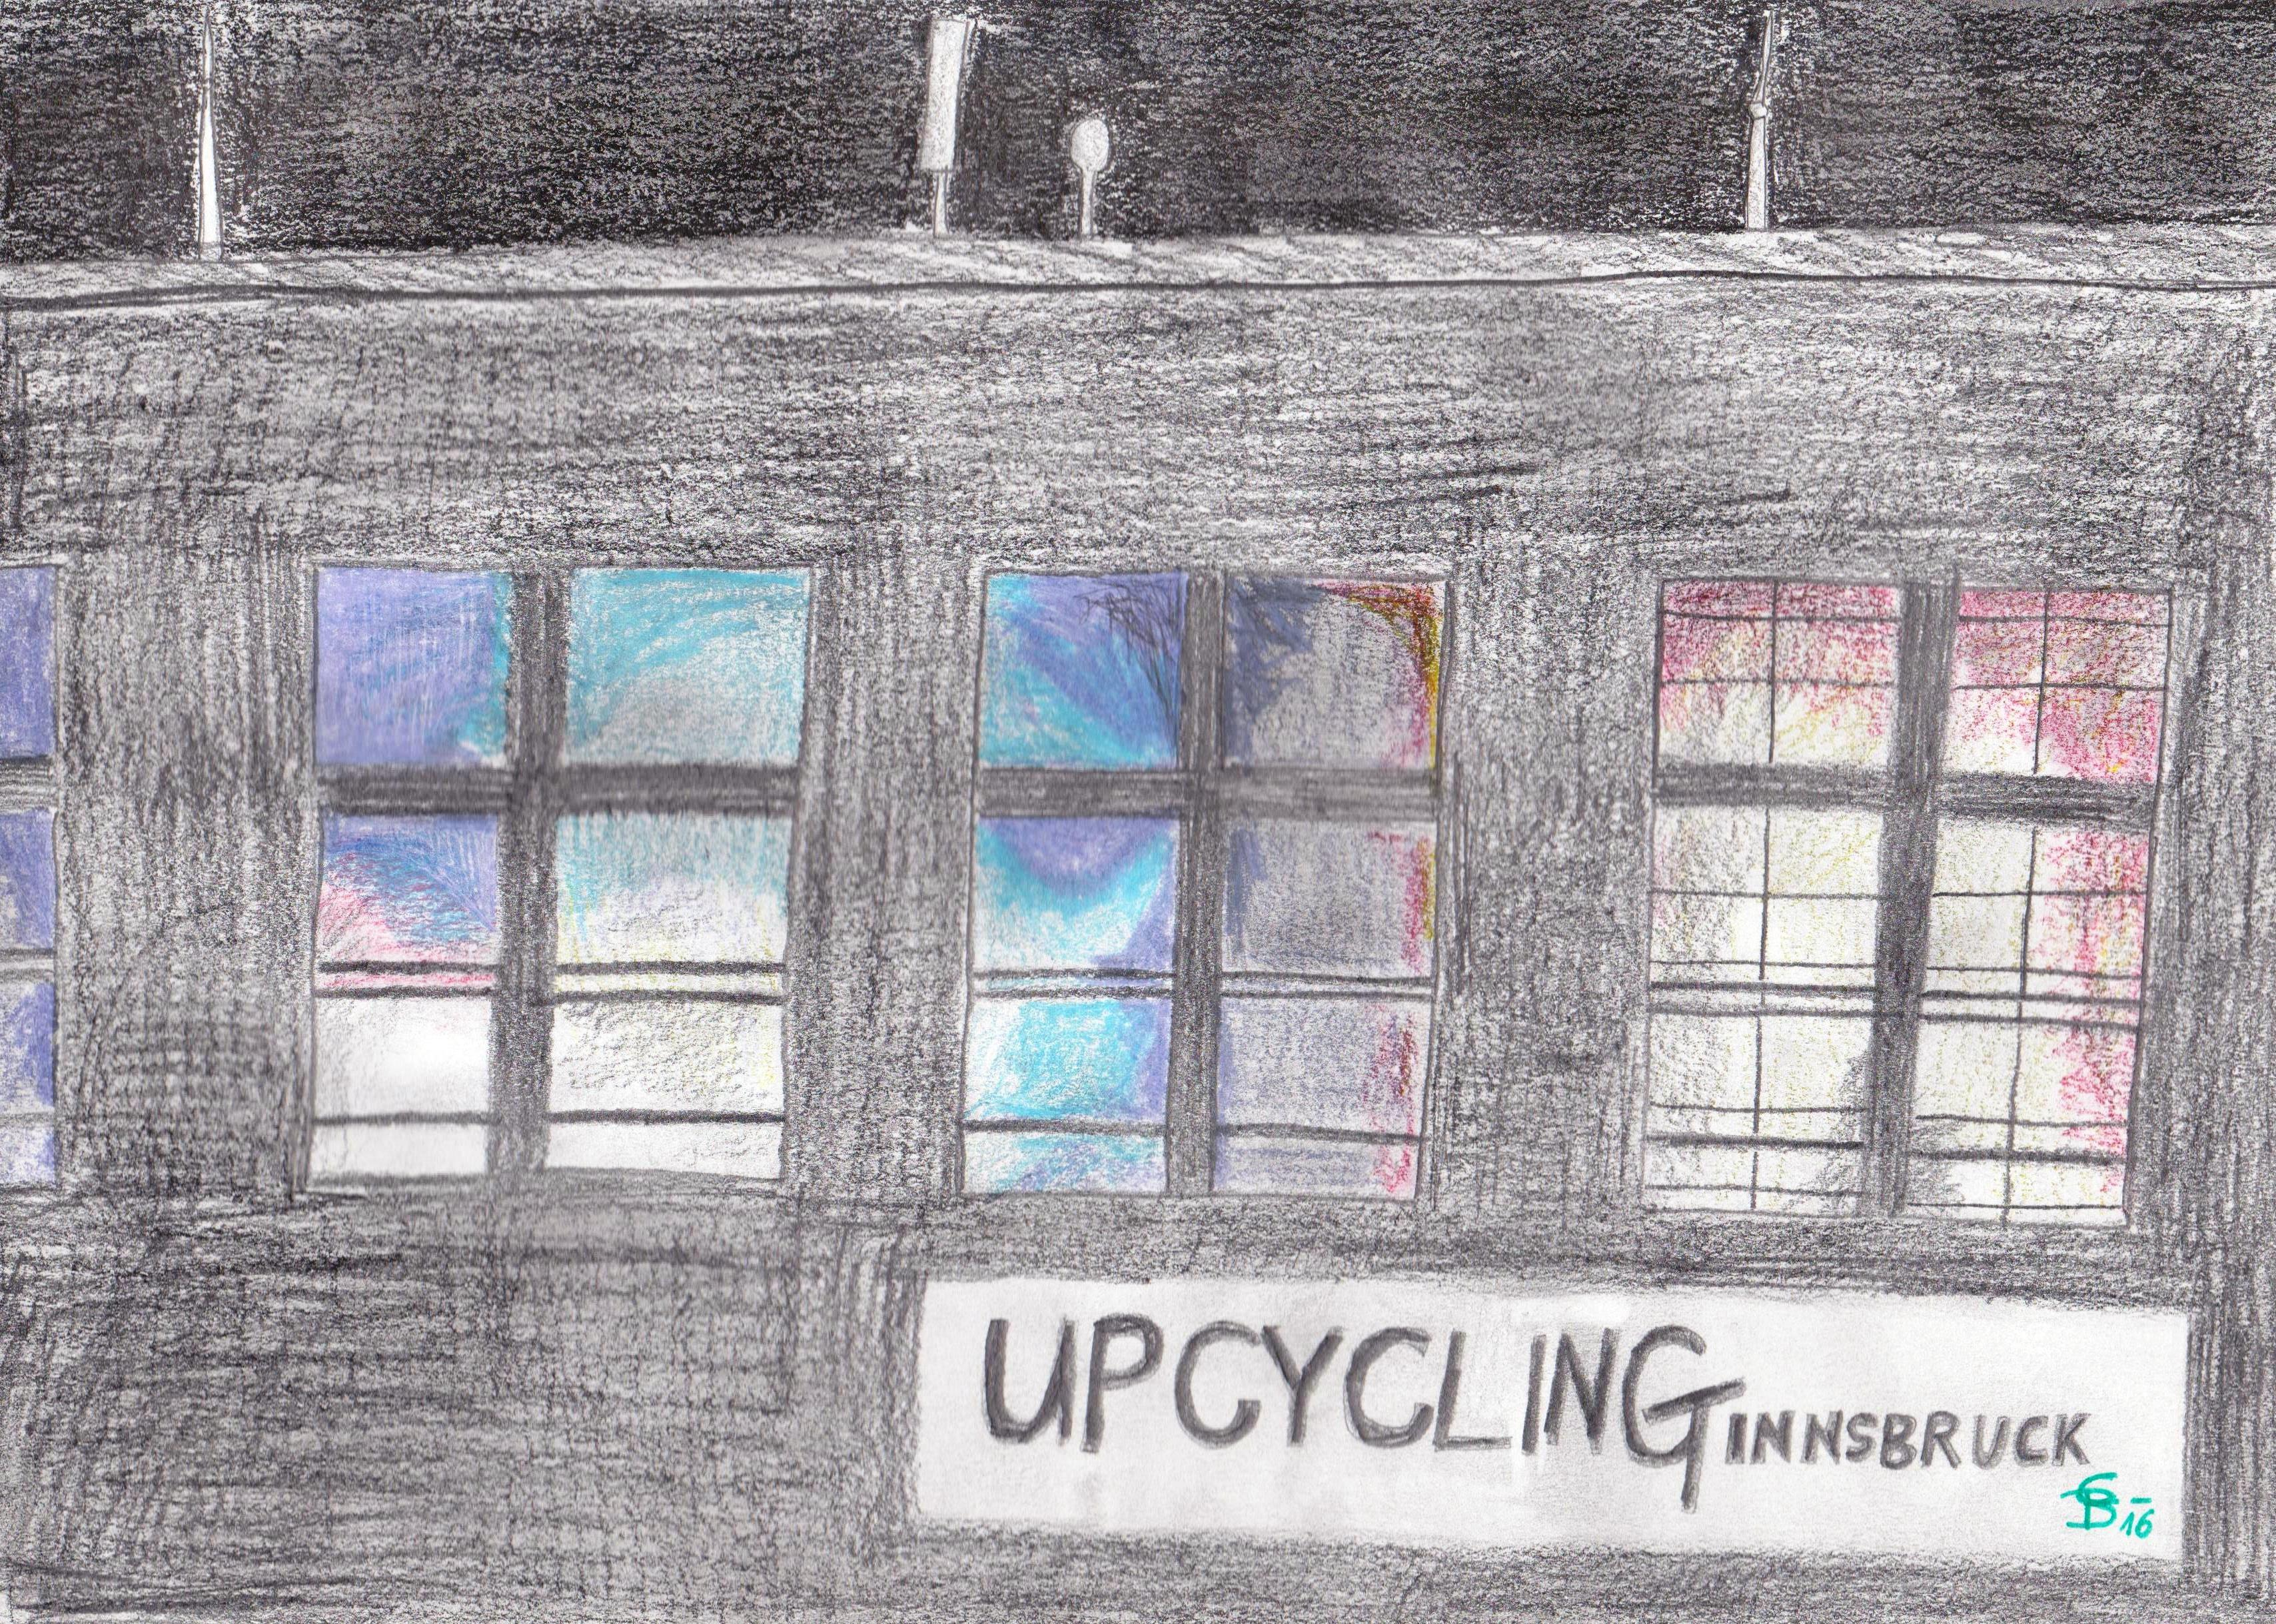 Stöcklgebäude Upcycling